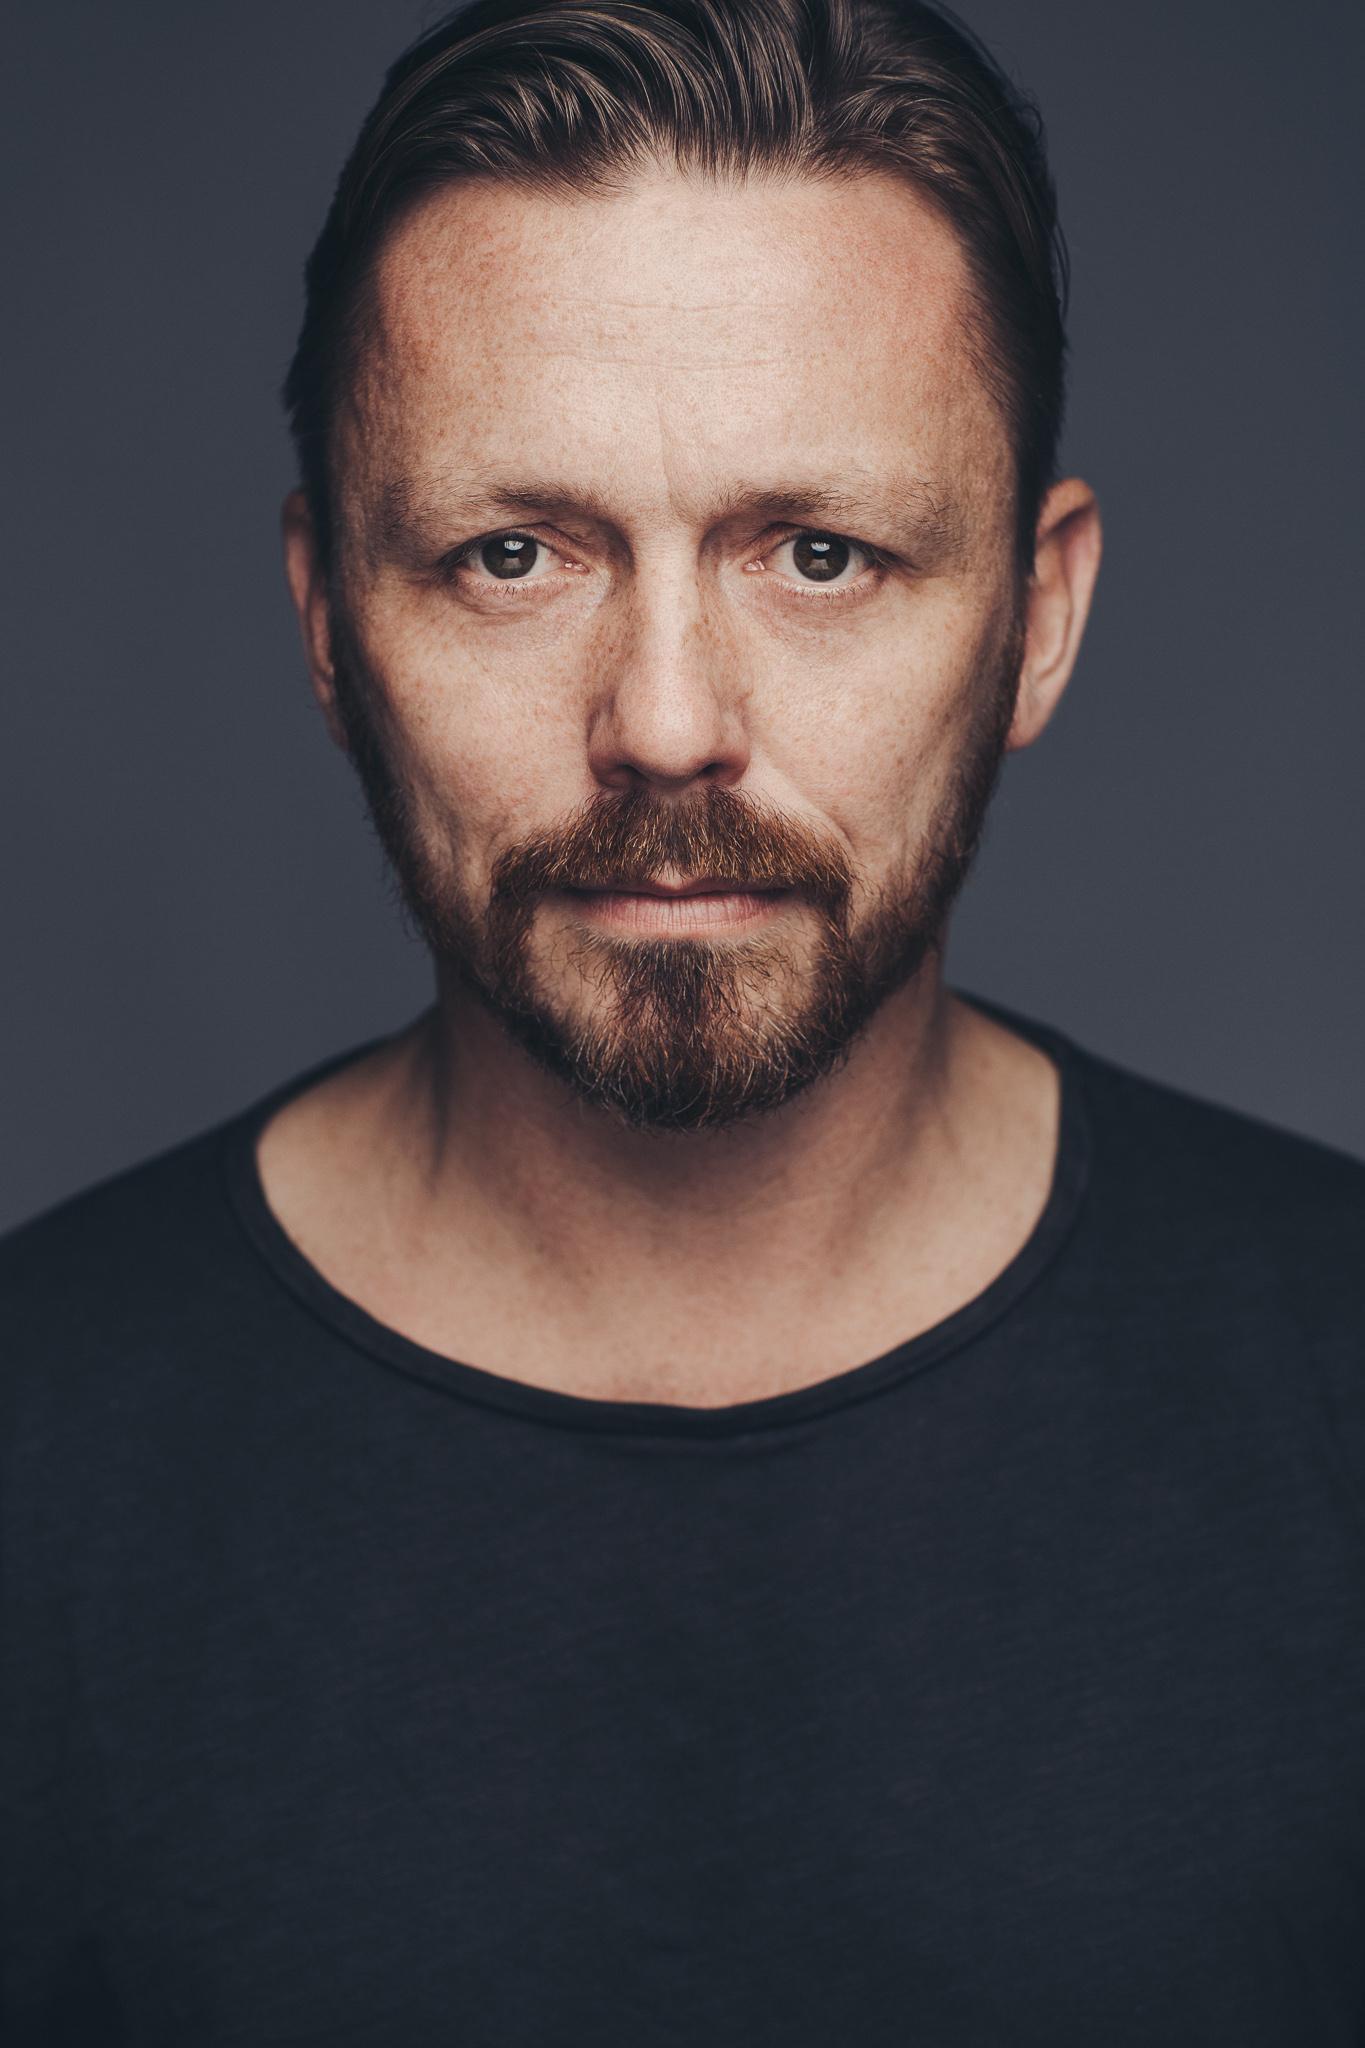 Henrik-Vestergaard-by-HEIN-Photography-2-web.jpg